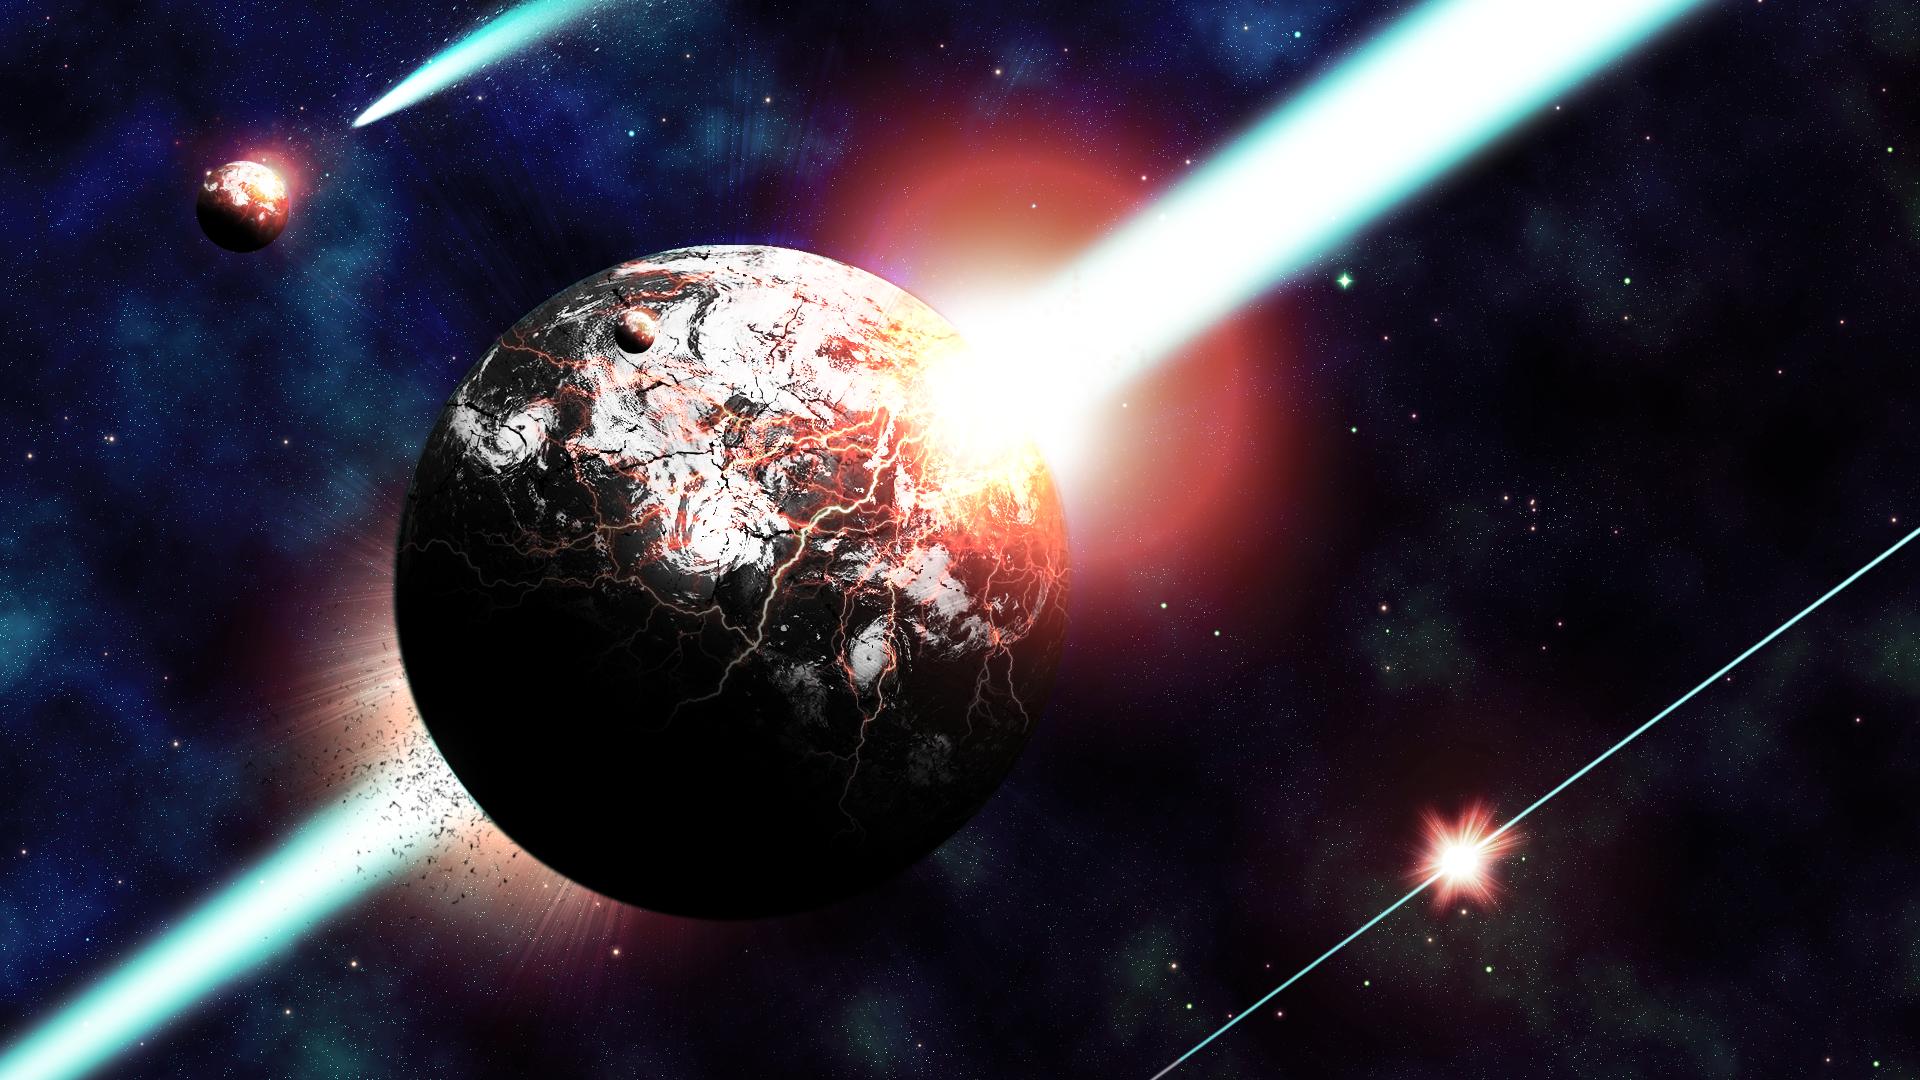 Destroying Worlds (Wallpaper) by Hardii